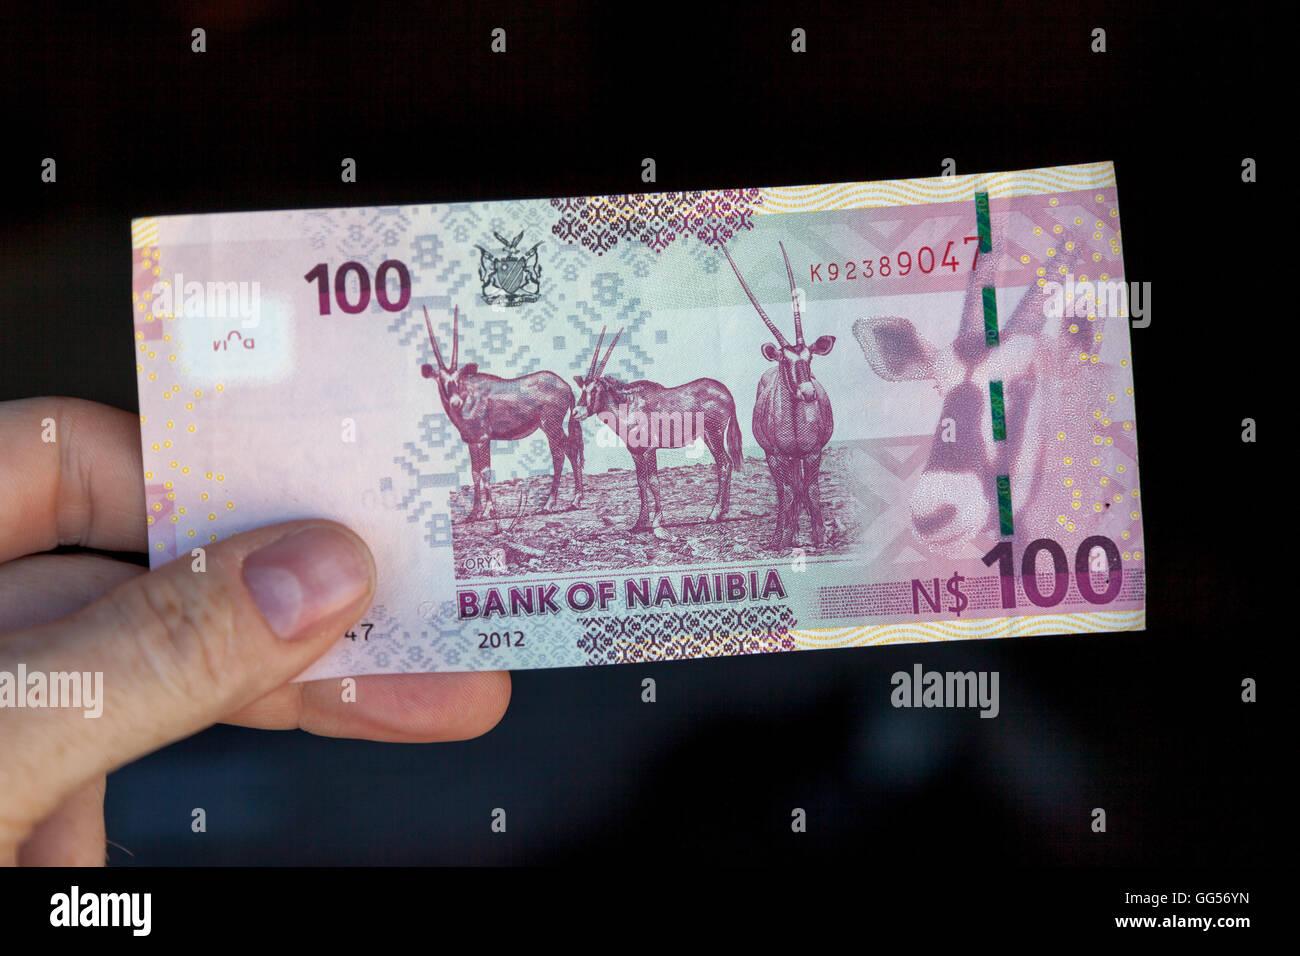 Namibia Namibian N$100 bill depicting Oryx - Stock Image